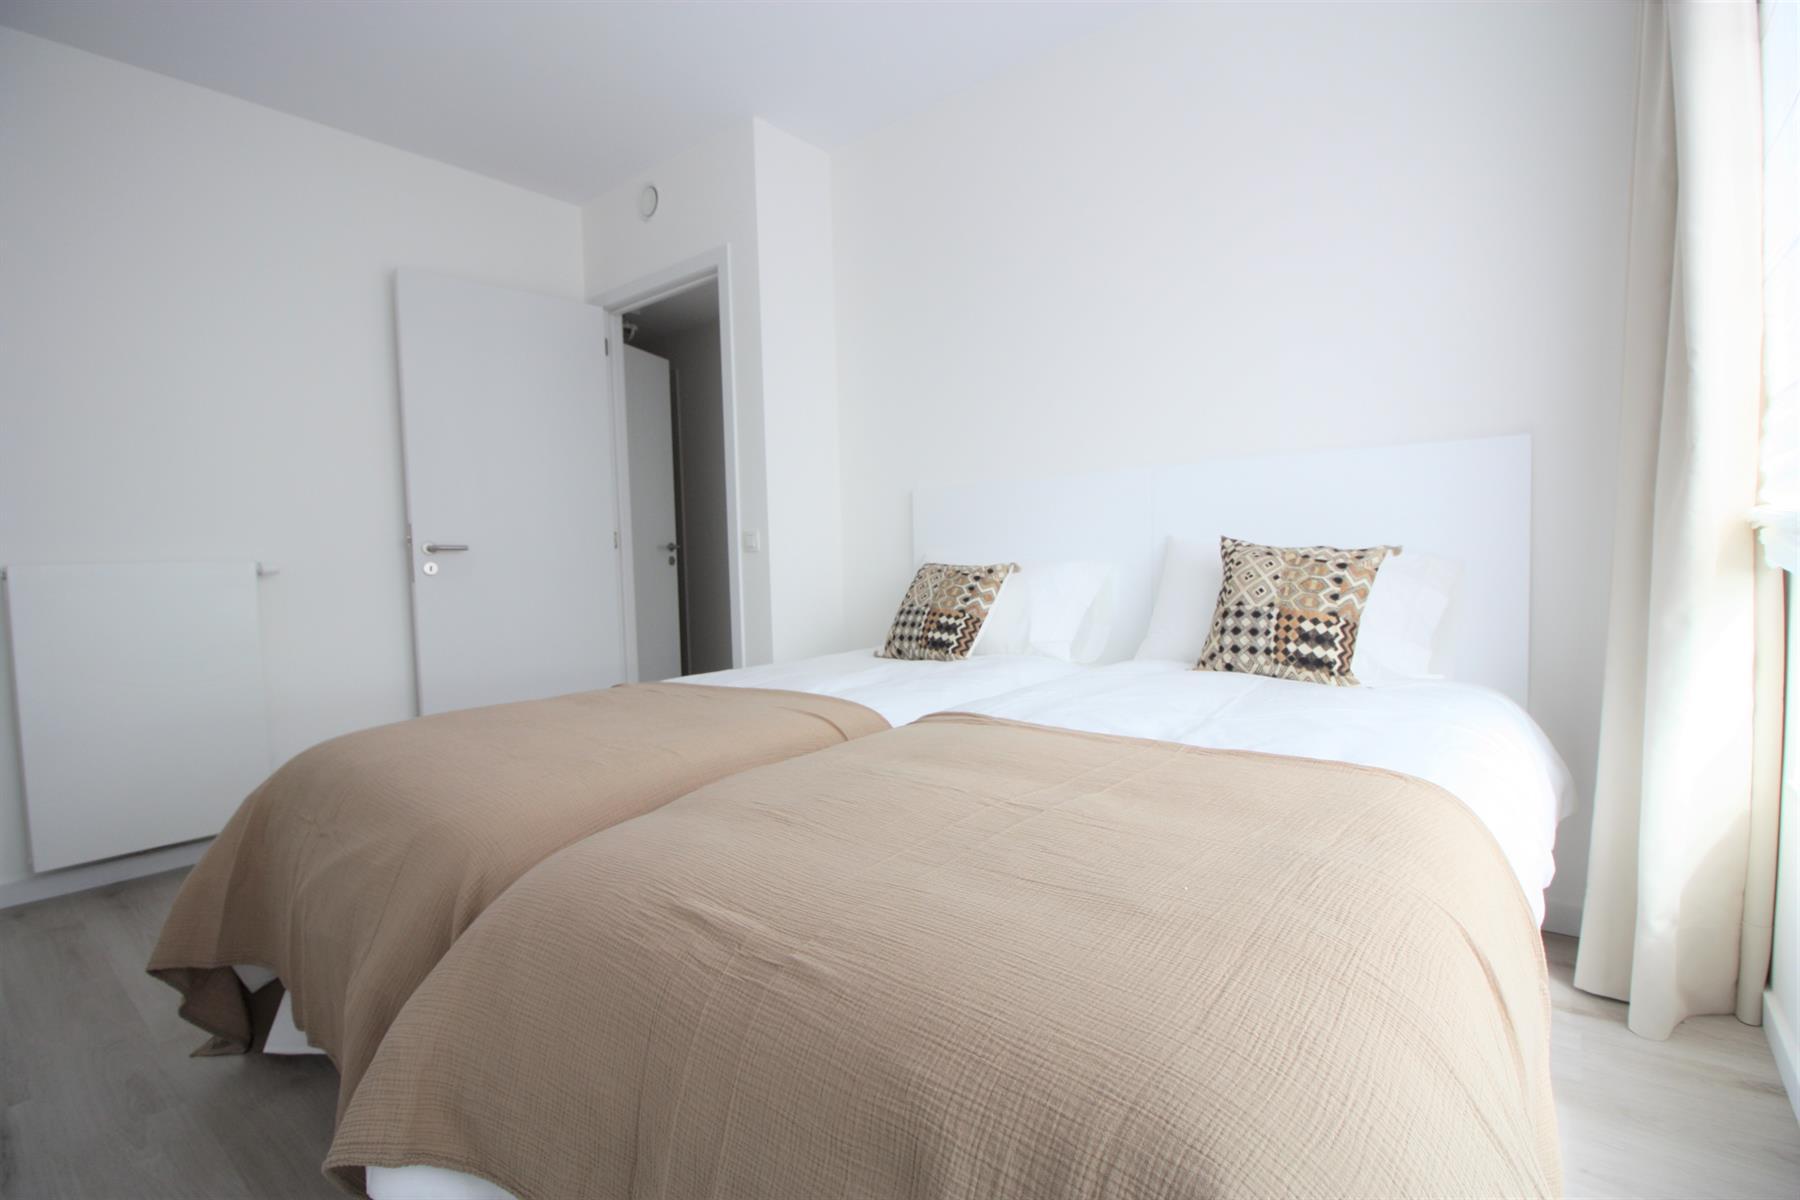 Appartement - Woluwe-Saint-Lambert - #4395355-12